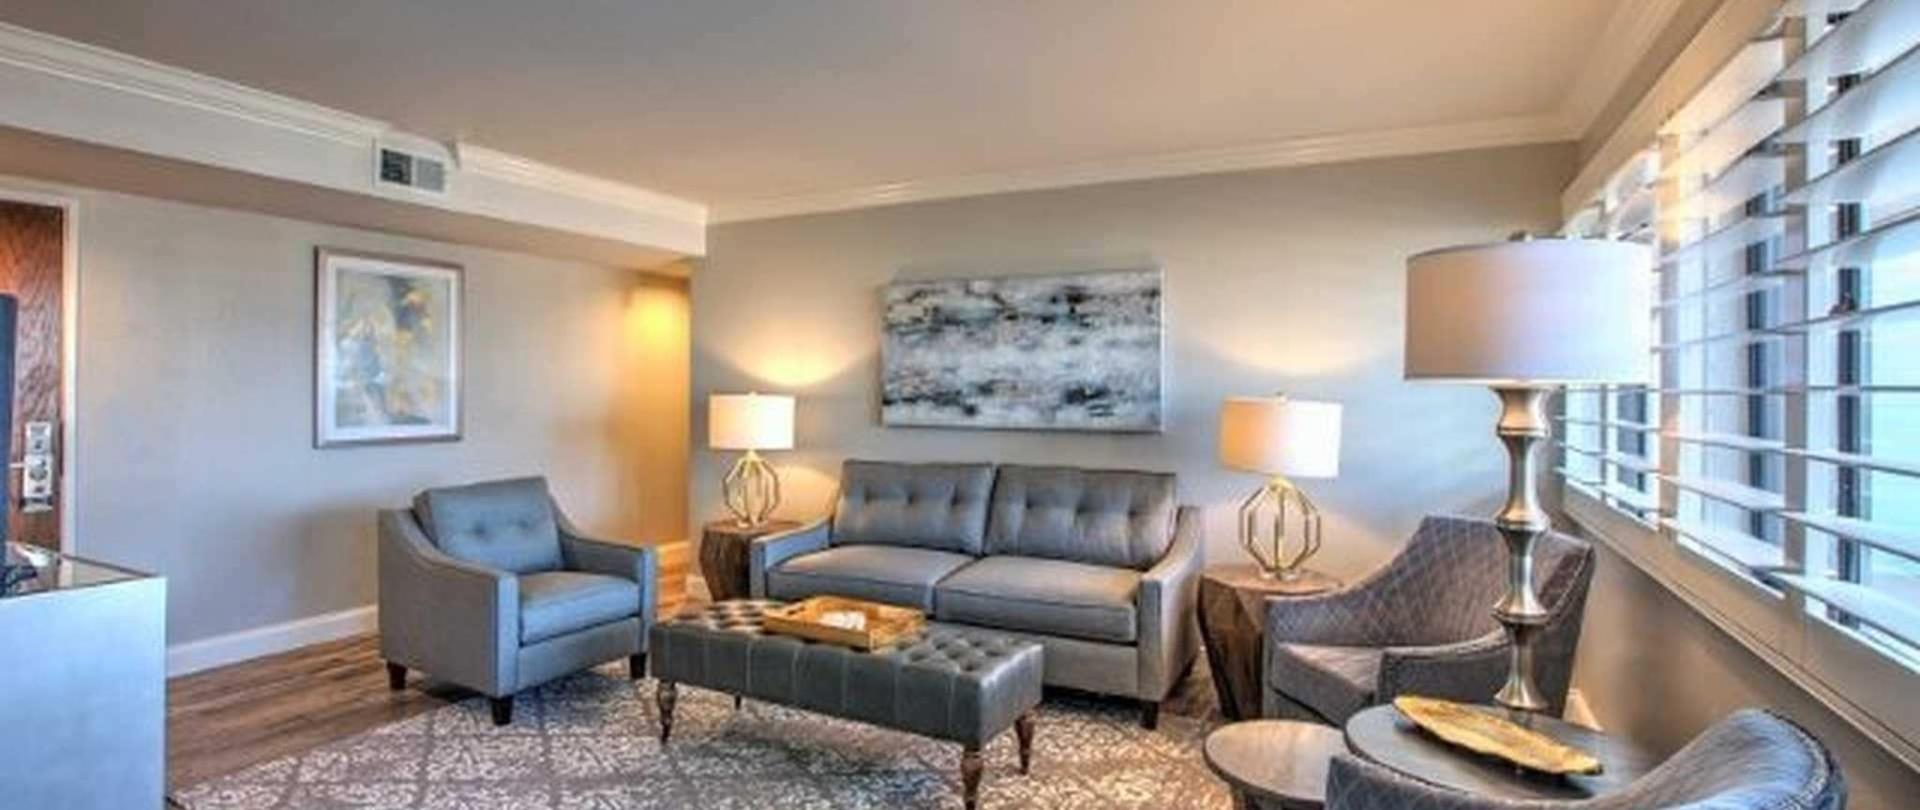 livingroom4-version-2-3-jpg-resize.jpg.1920x810_default.jpeg.1920x0.jpeg